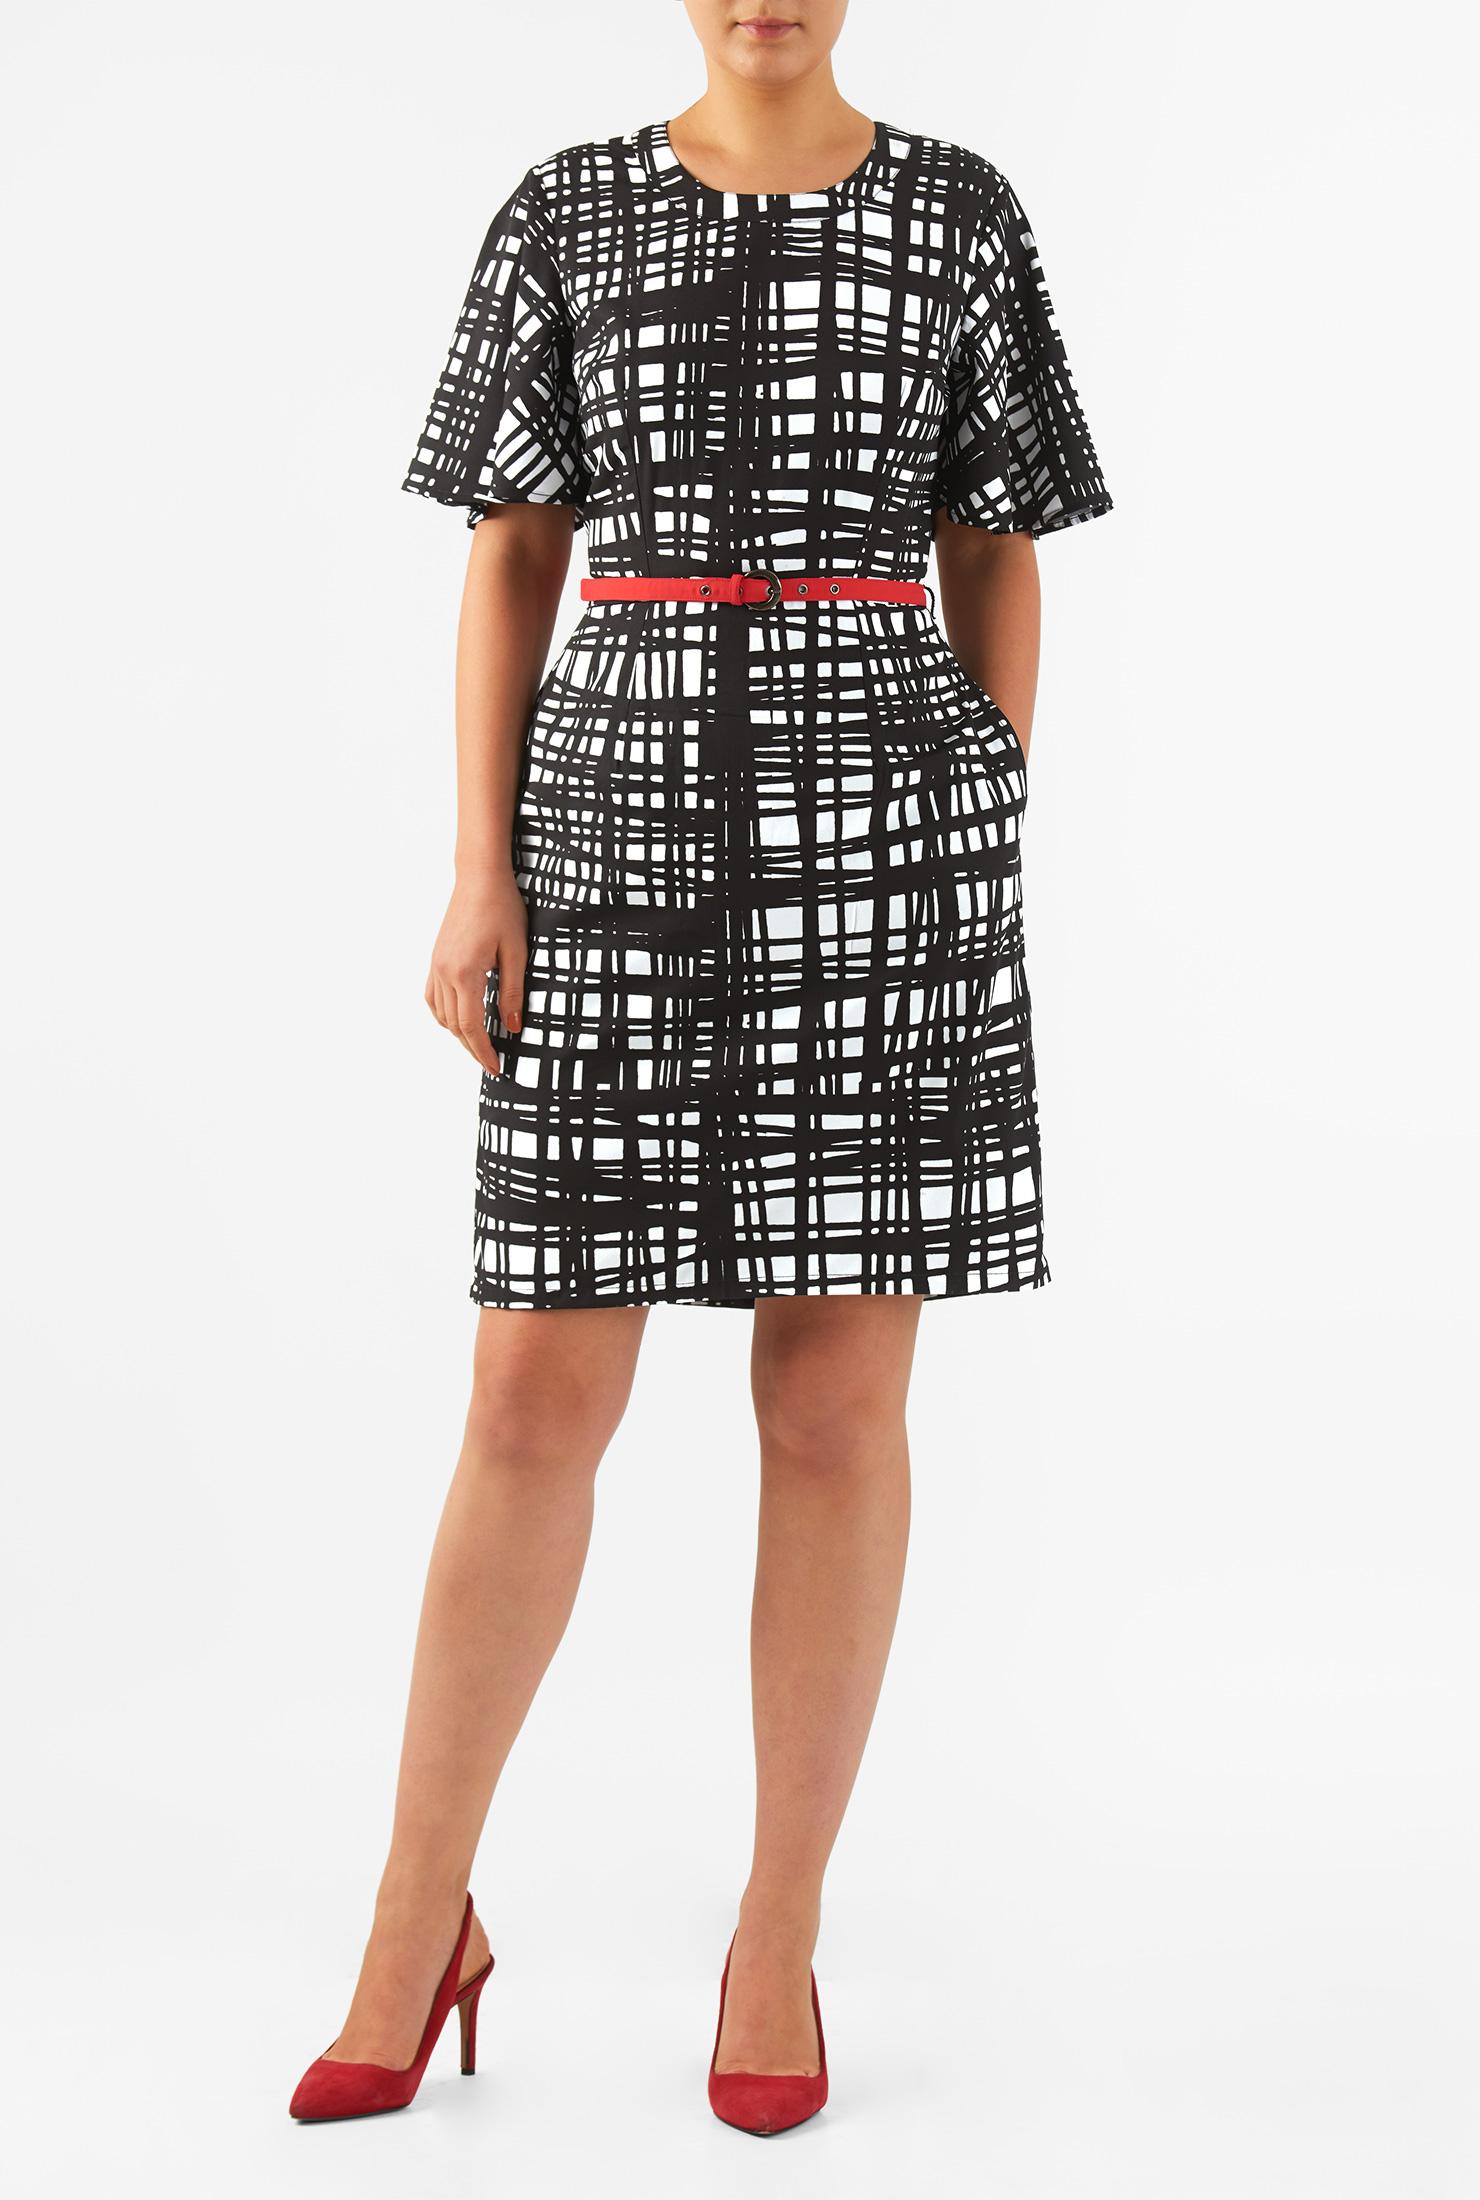 Eshakti Womens Graphic Print Crepe Belted Sheath Dress